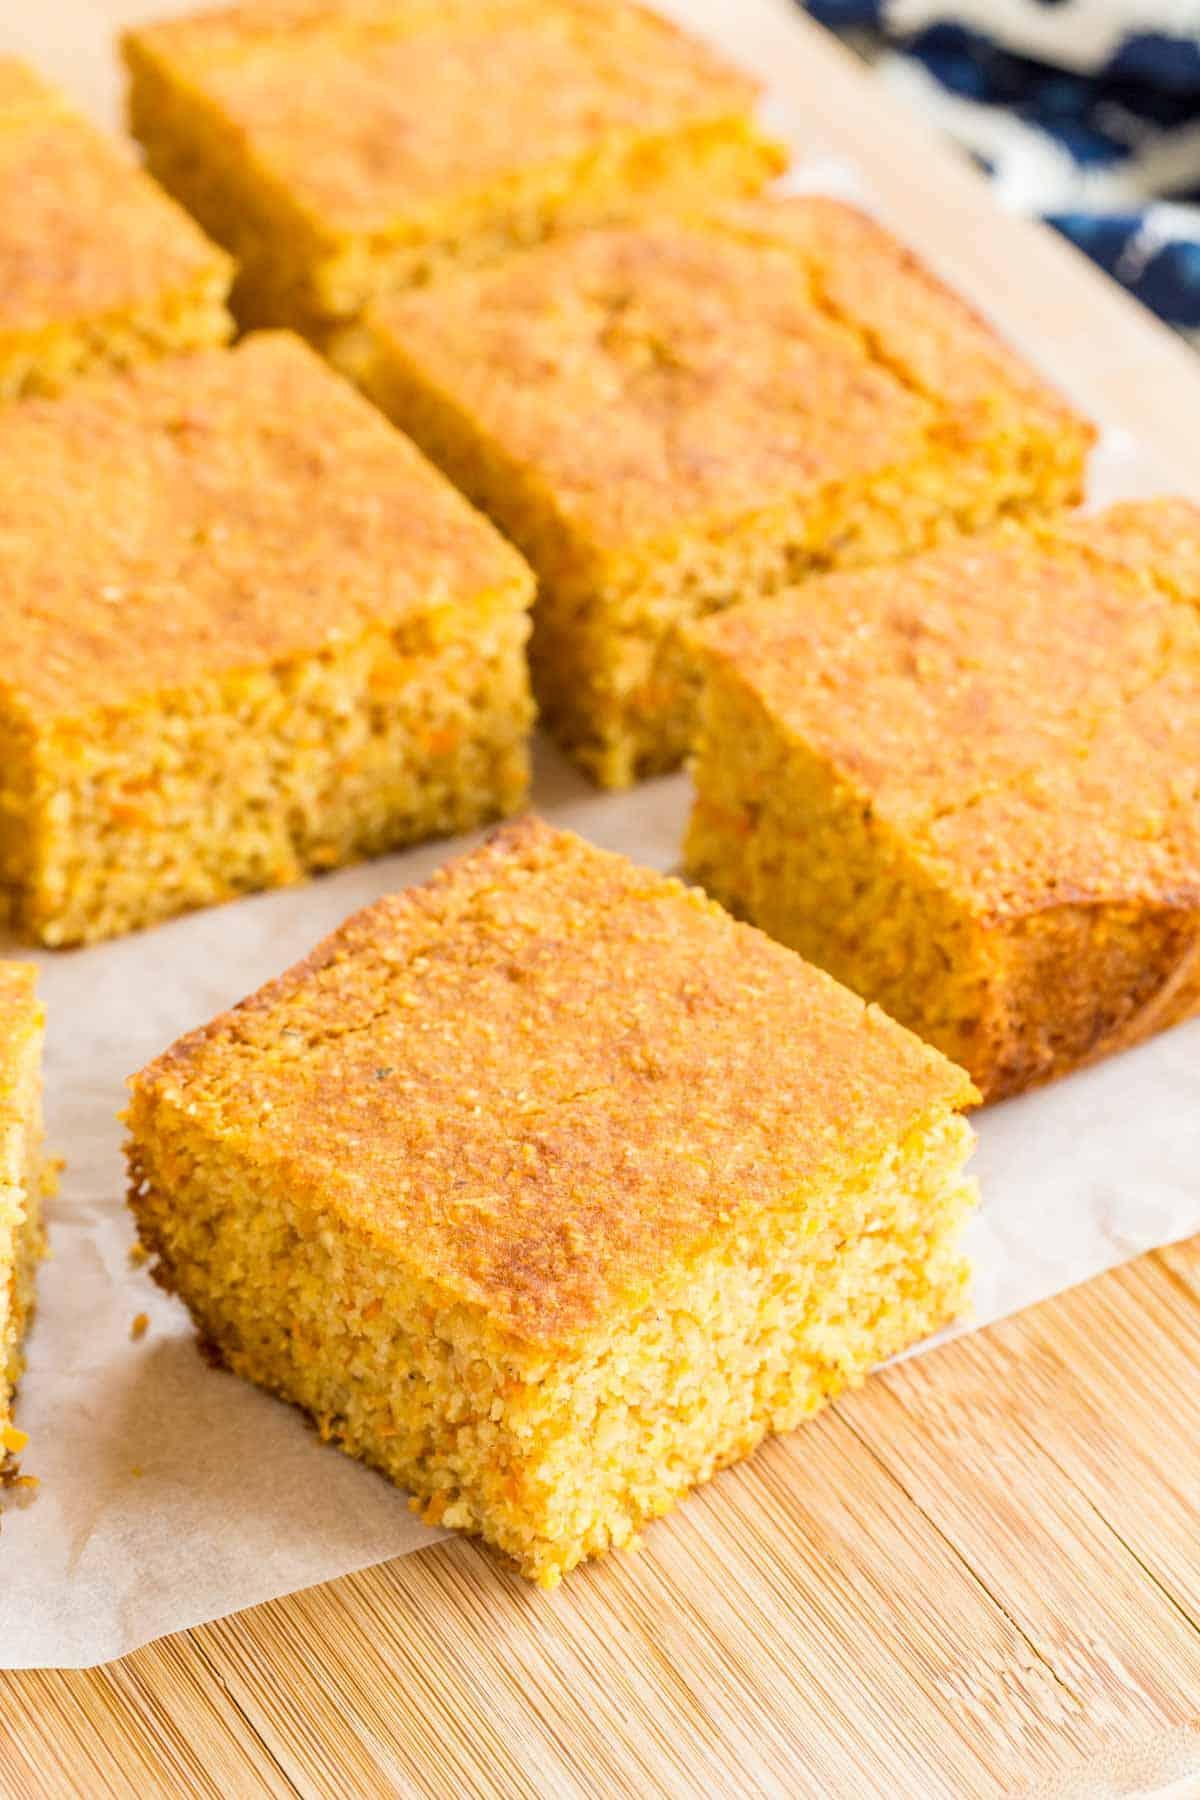 slices of gluten free cornbread